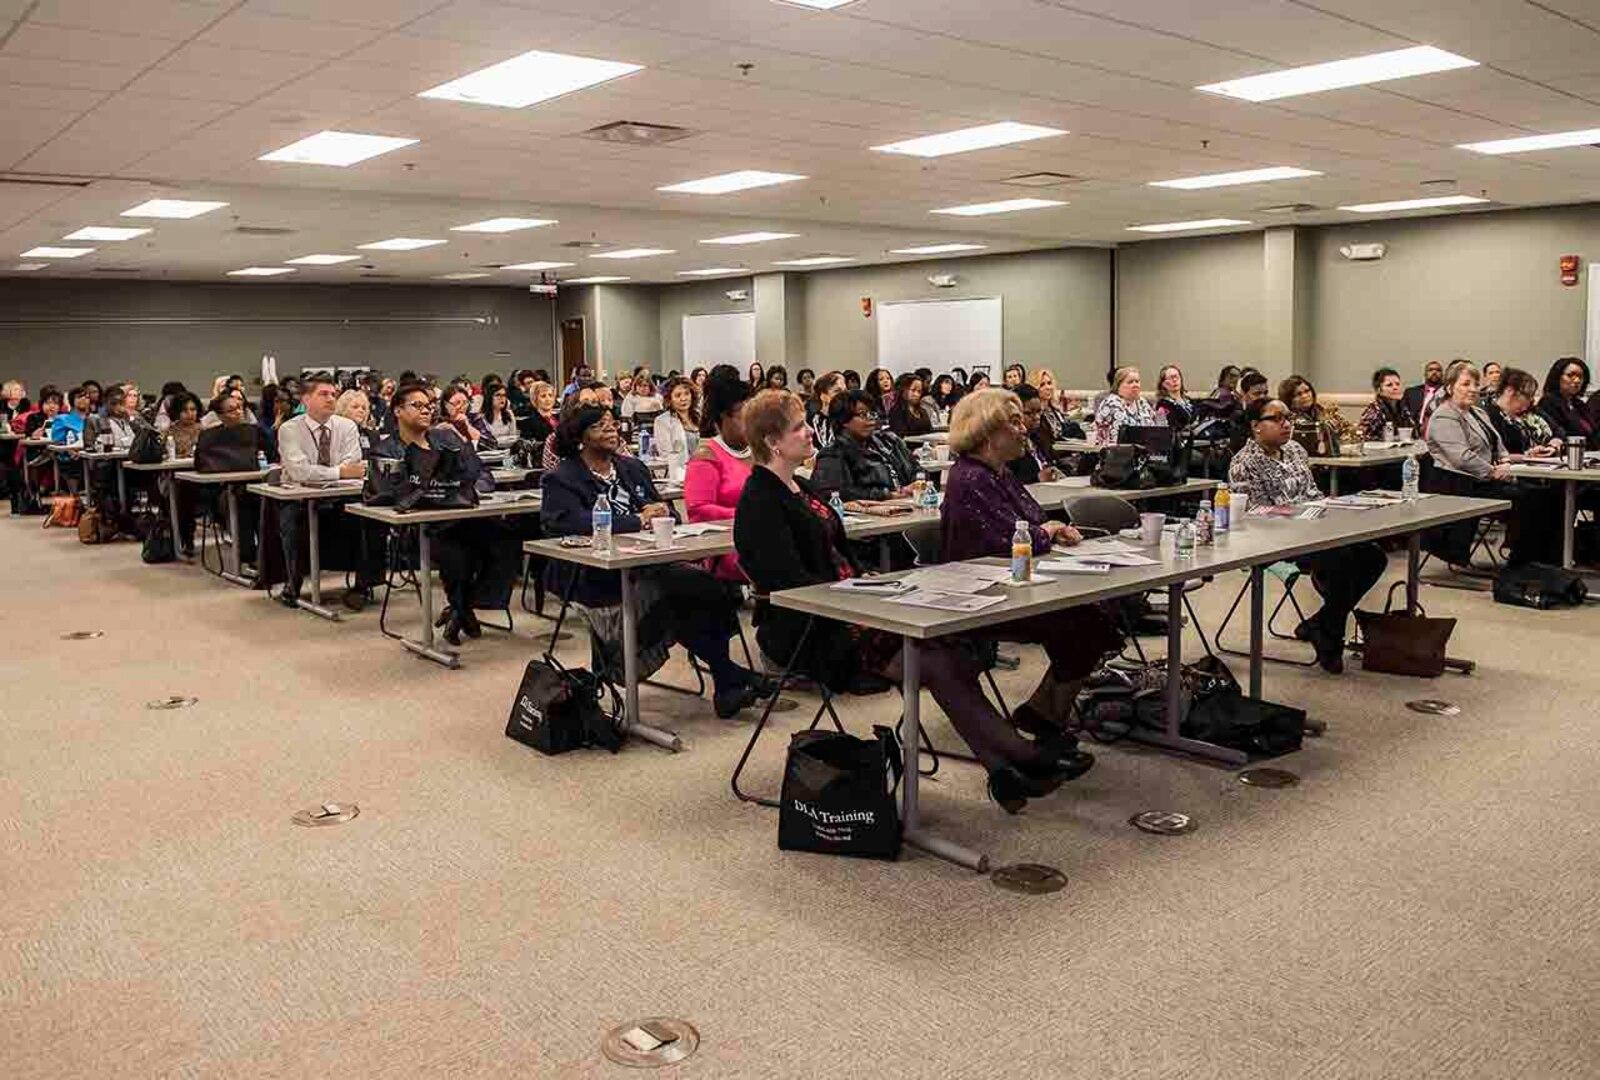 Women celebrated at DSCC leadership summit